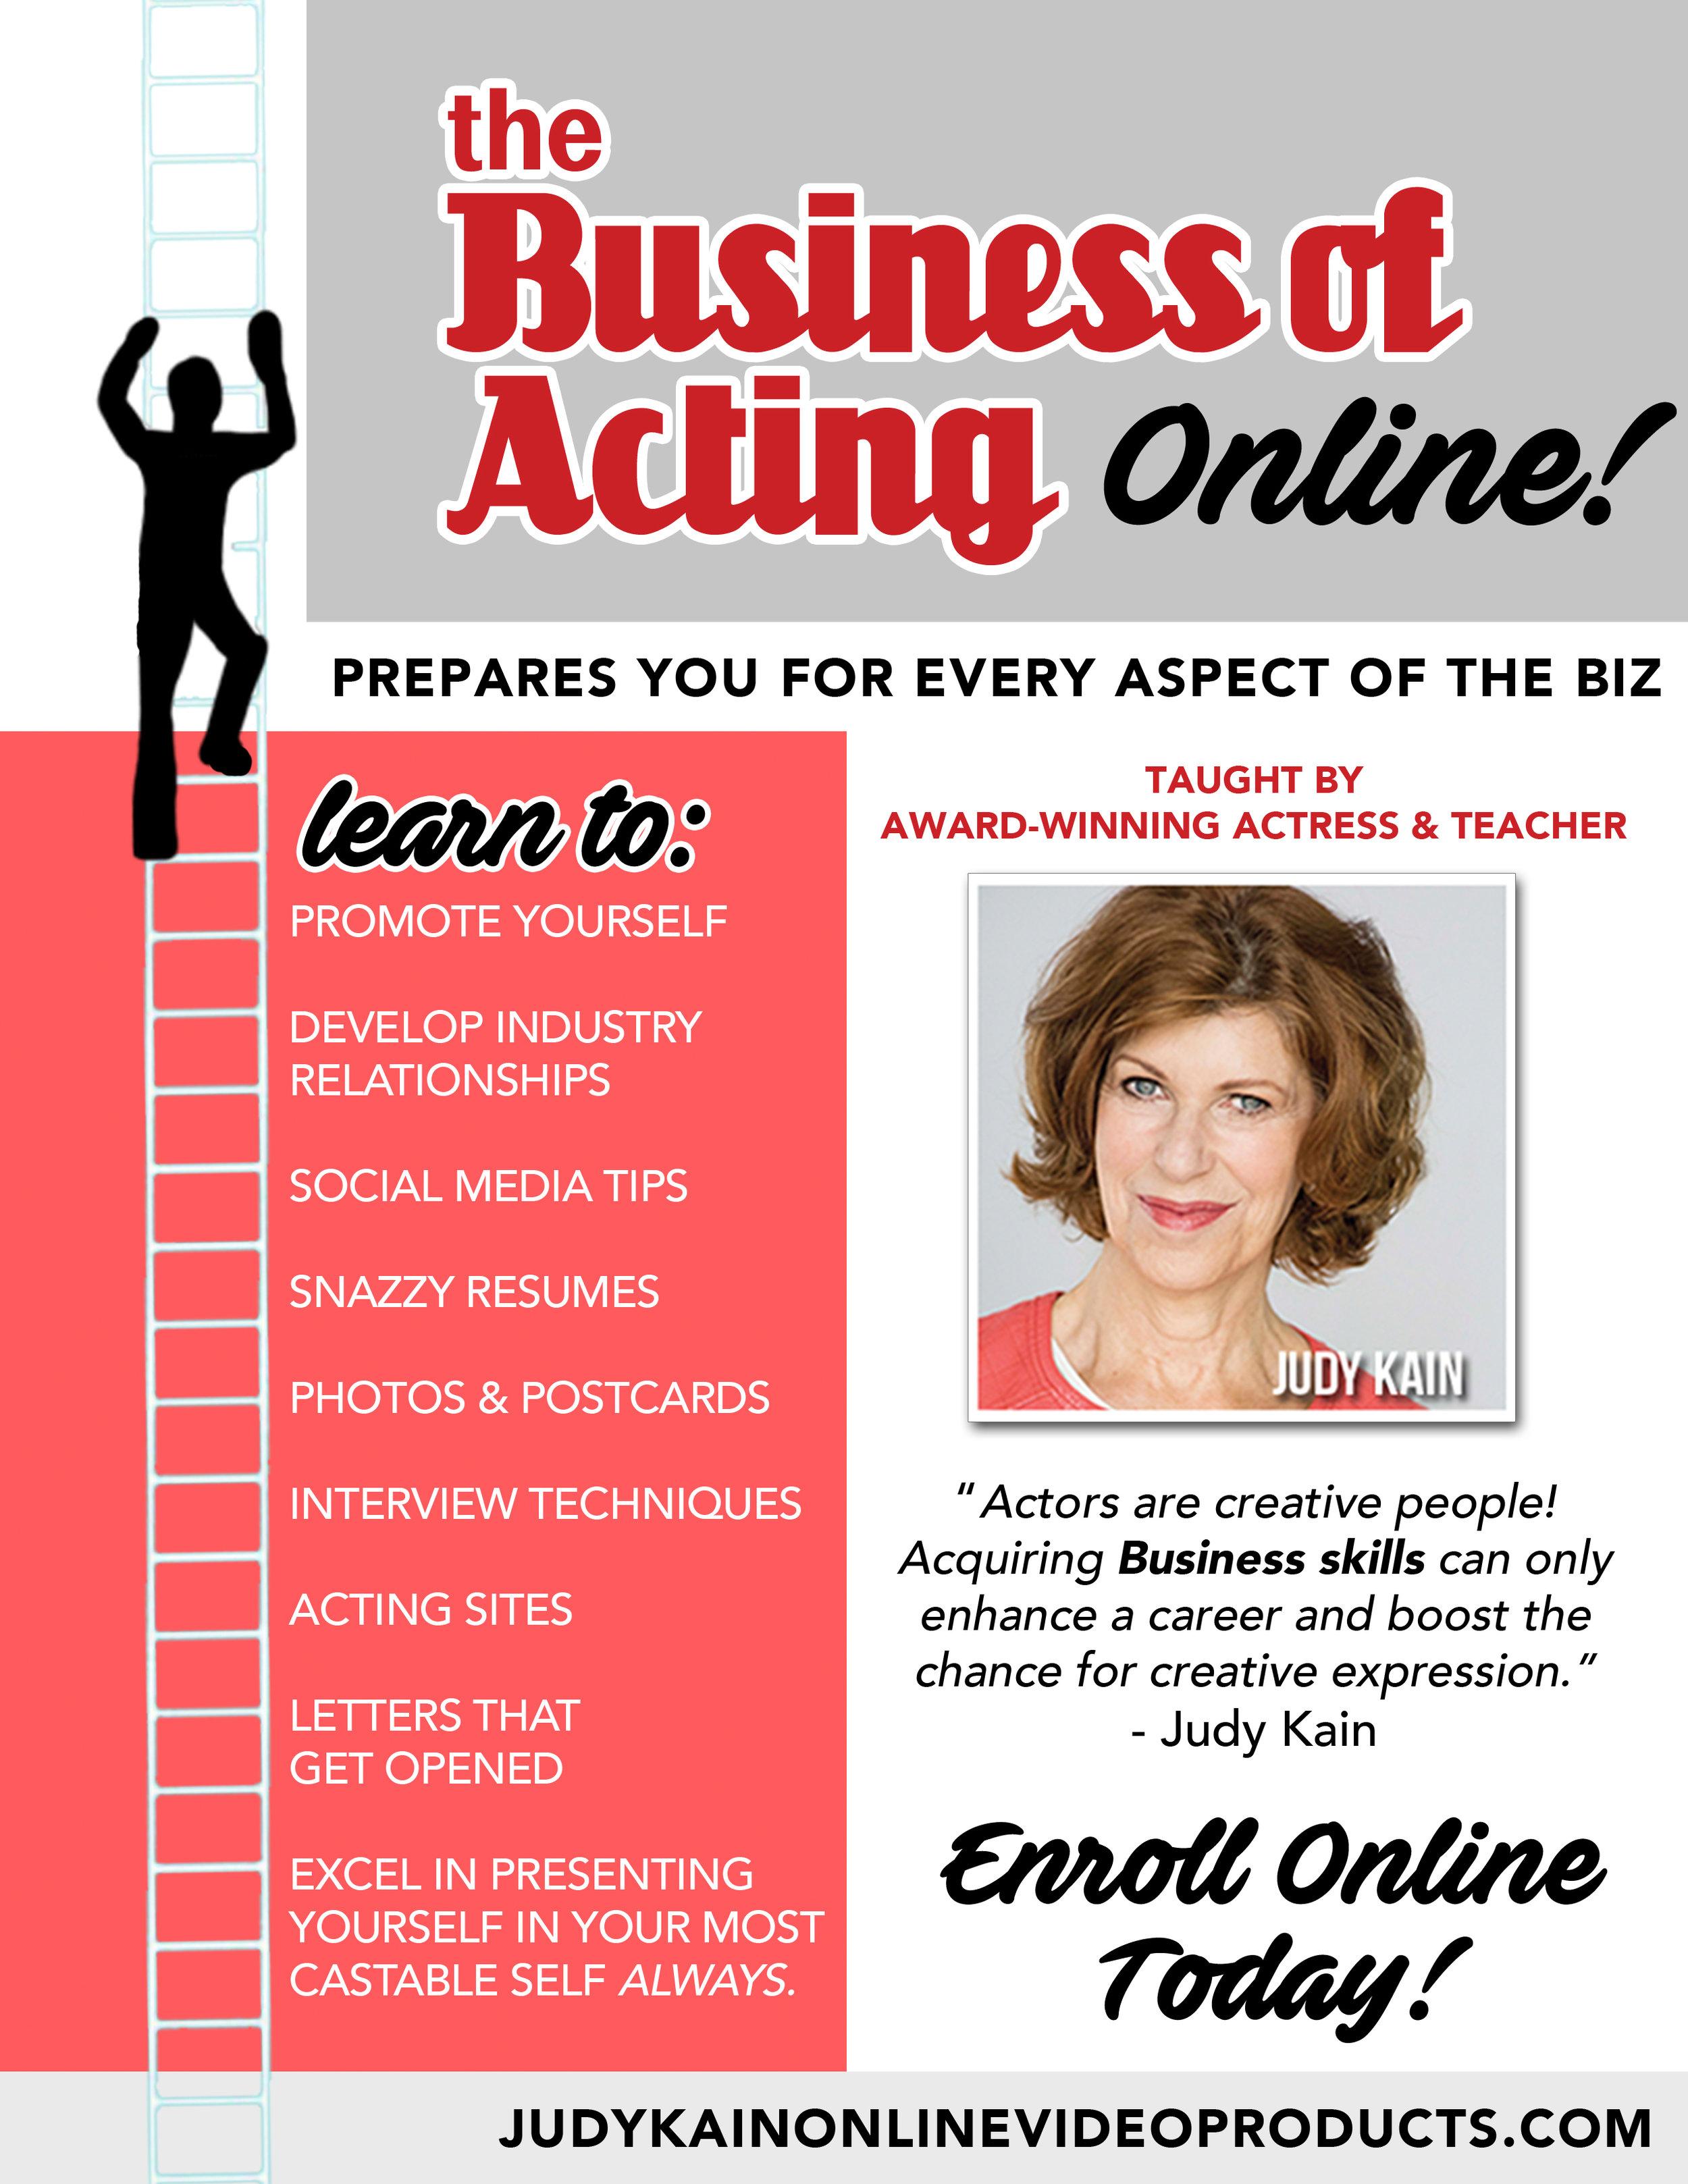 BusinessOfActing online ladder.jpg